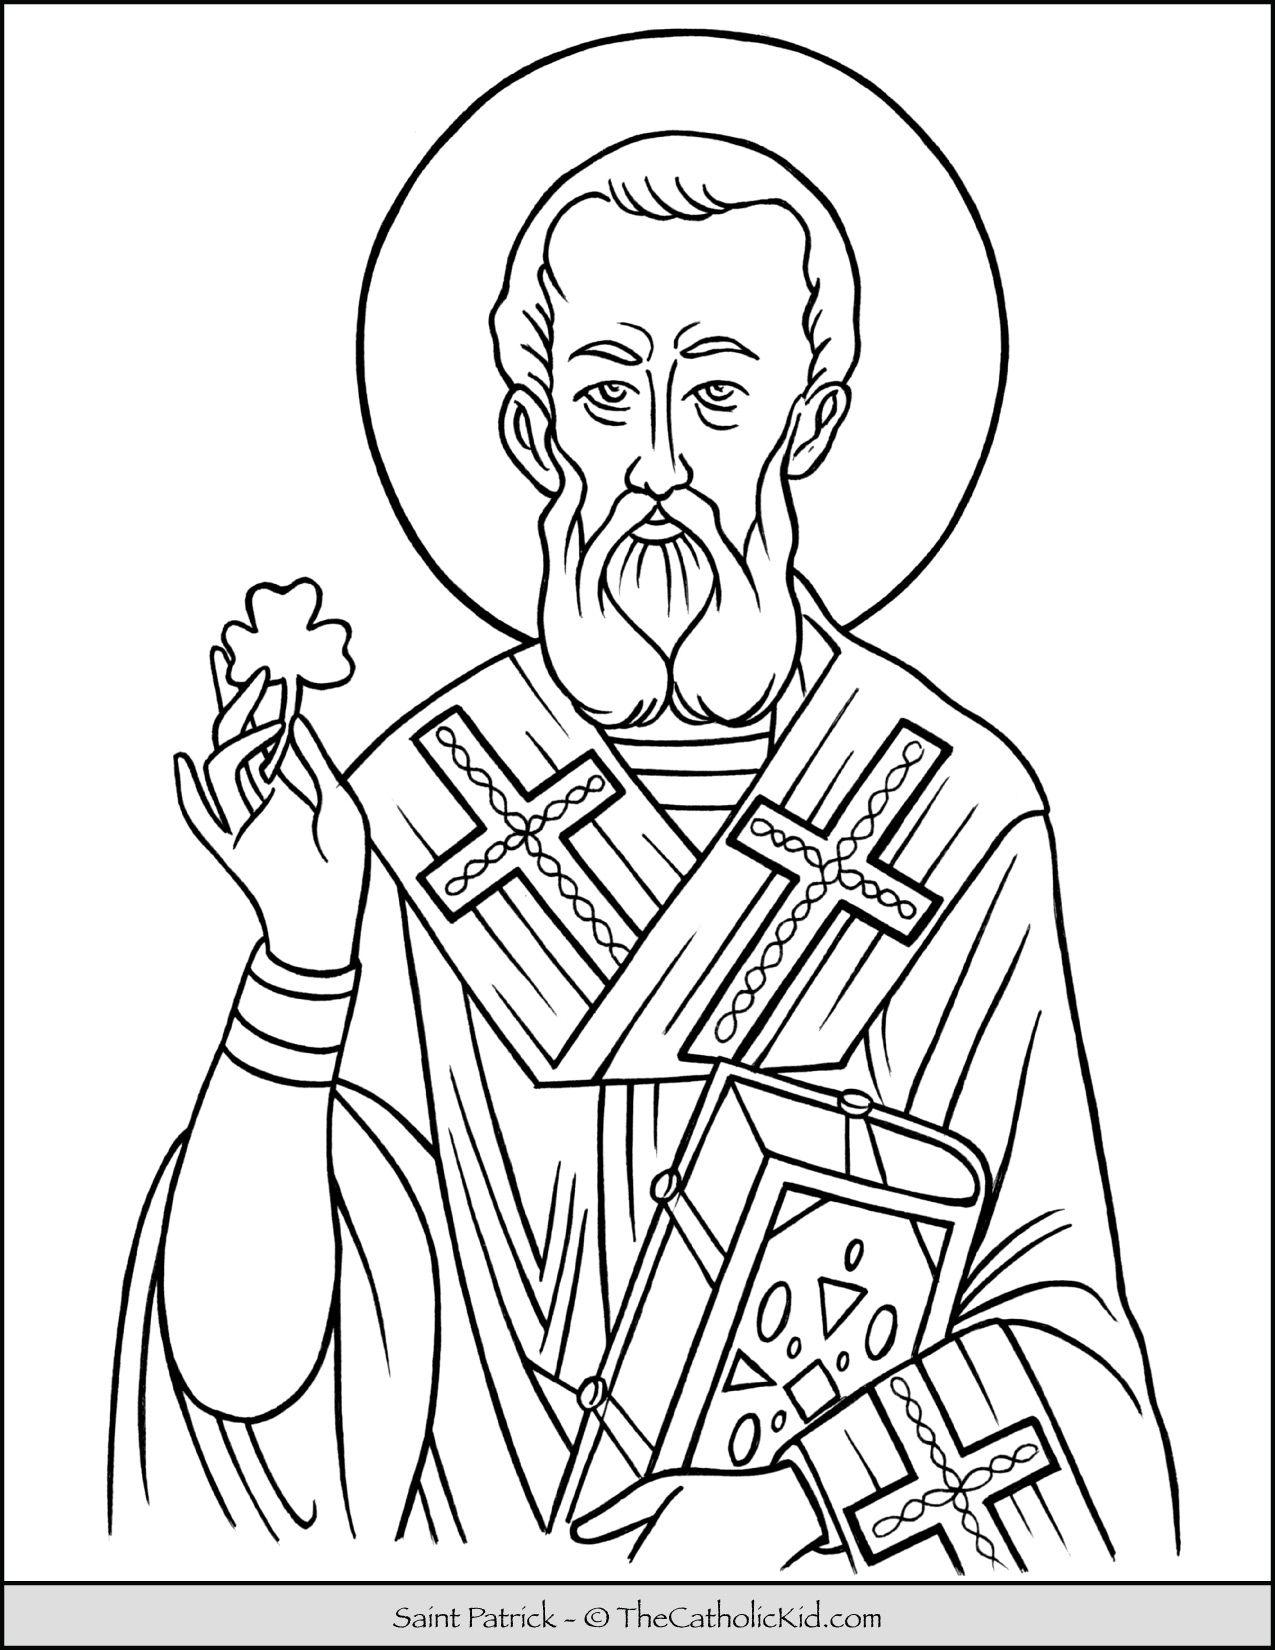 Saint Patrick Coloring Page Thecatholickid Com Coloring Pages Saint Coloring Catholic Coloring